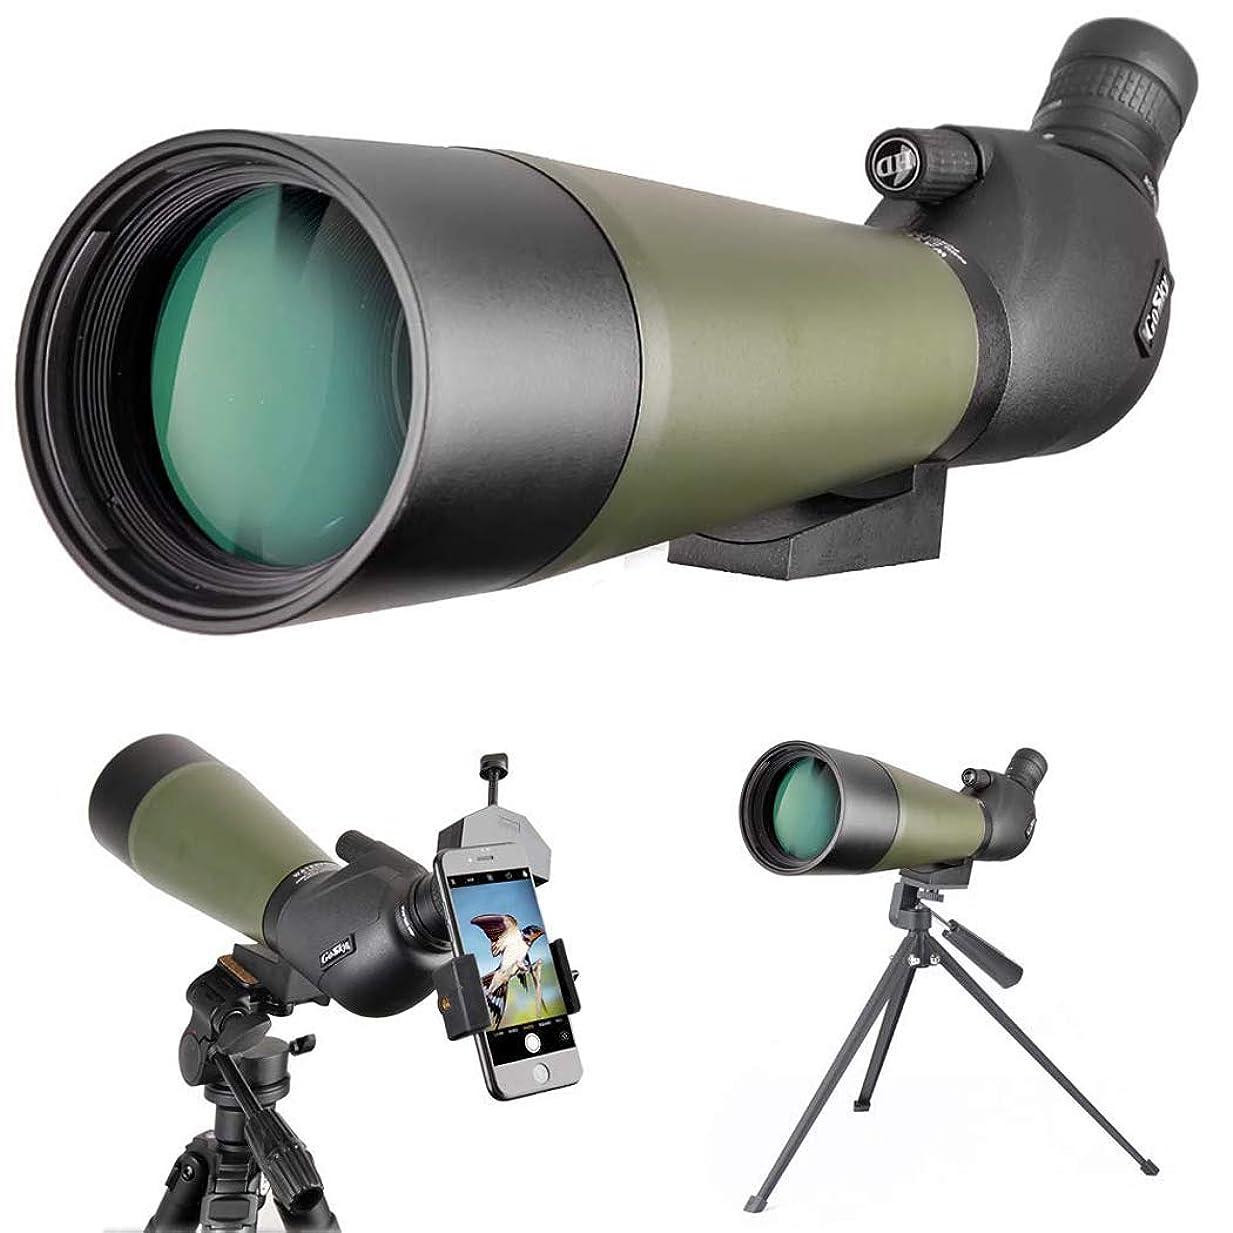 最少処方法廷20-60x80視力三脚、キャリーバッグ電話アダプタ - BAK4 45度の視界望遠鏡狩猟鳥野生生物観察野外風景